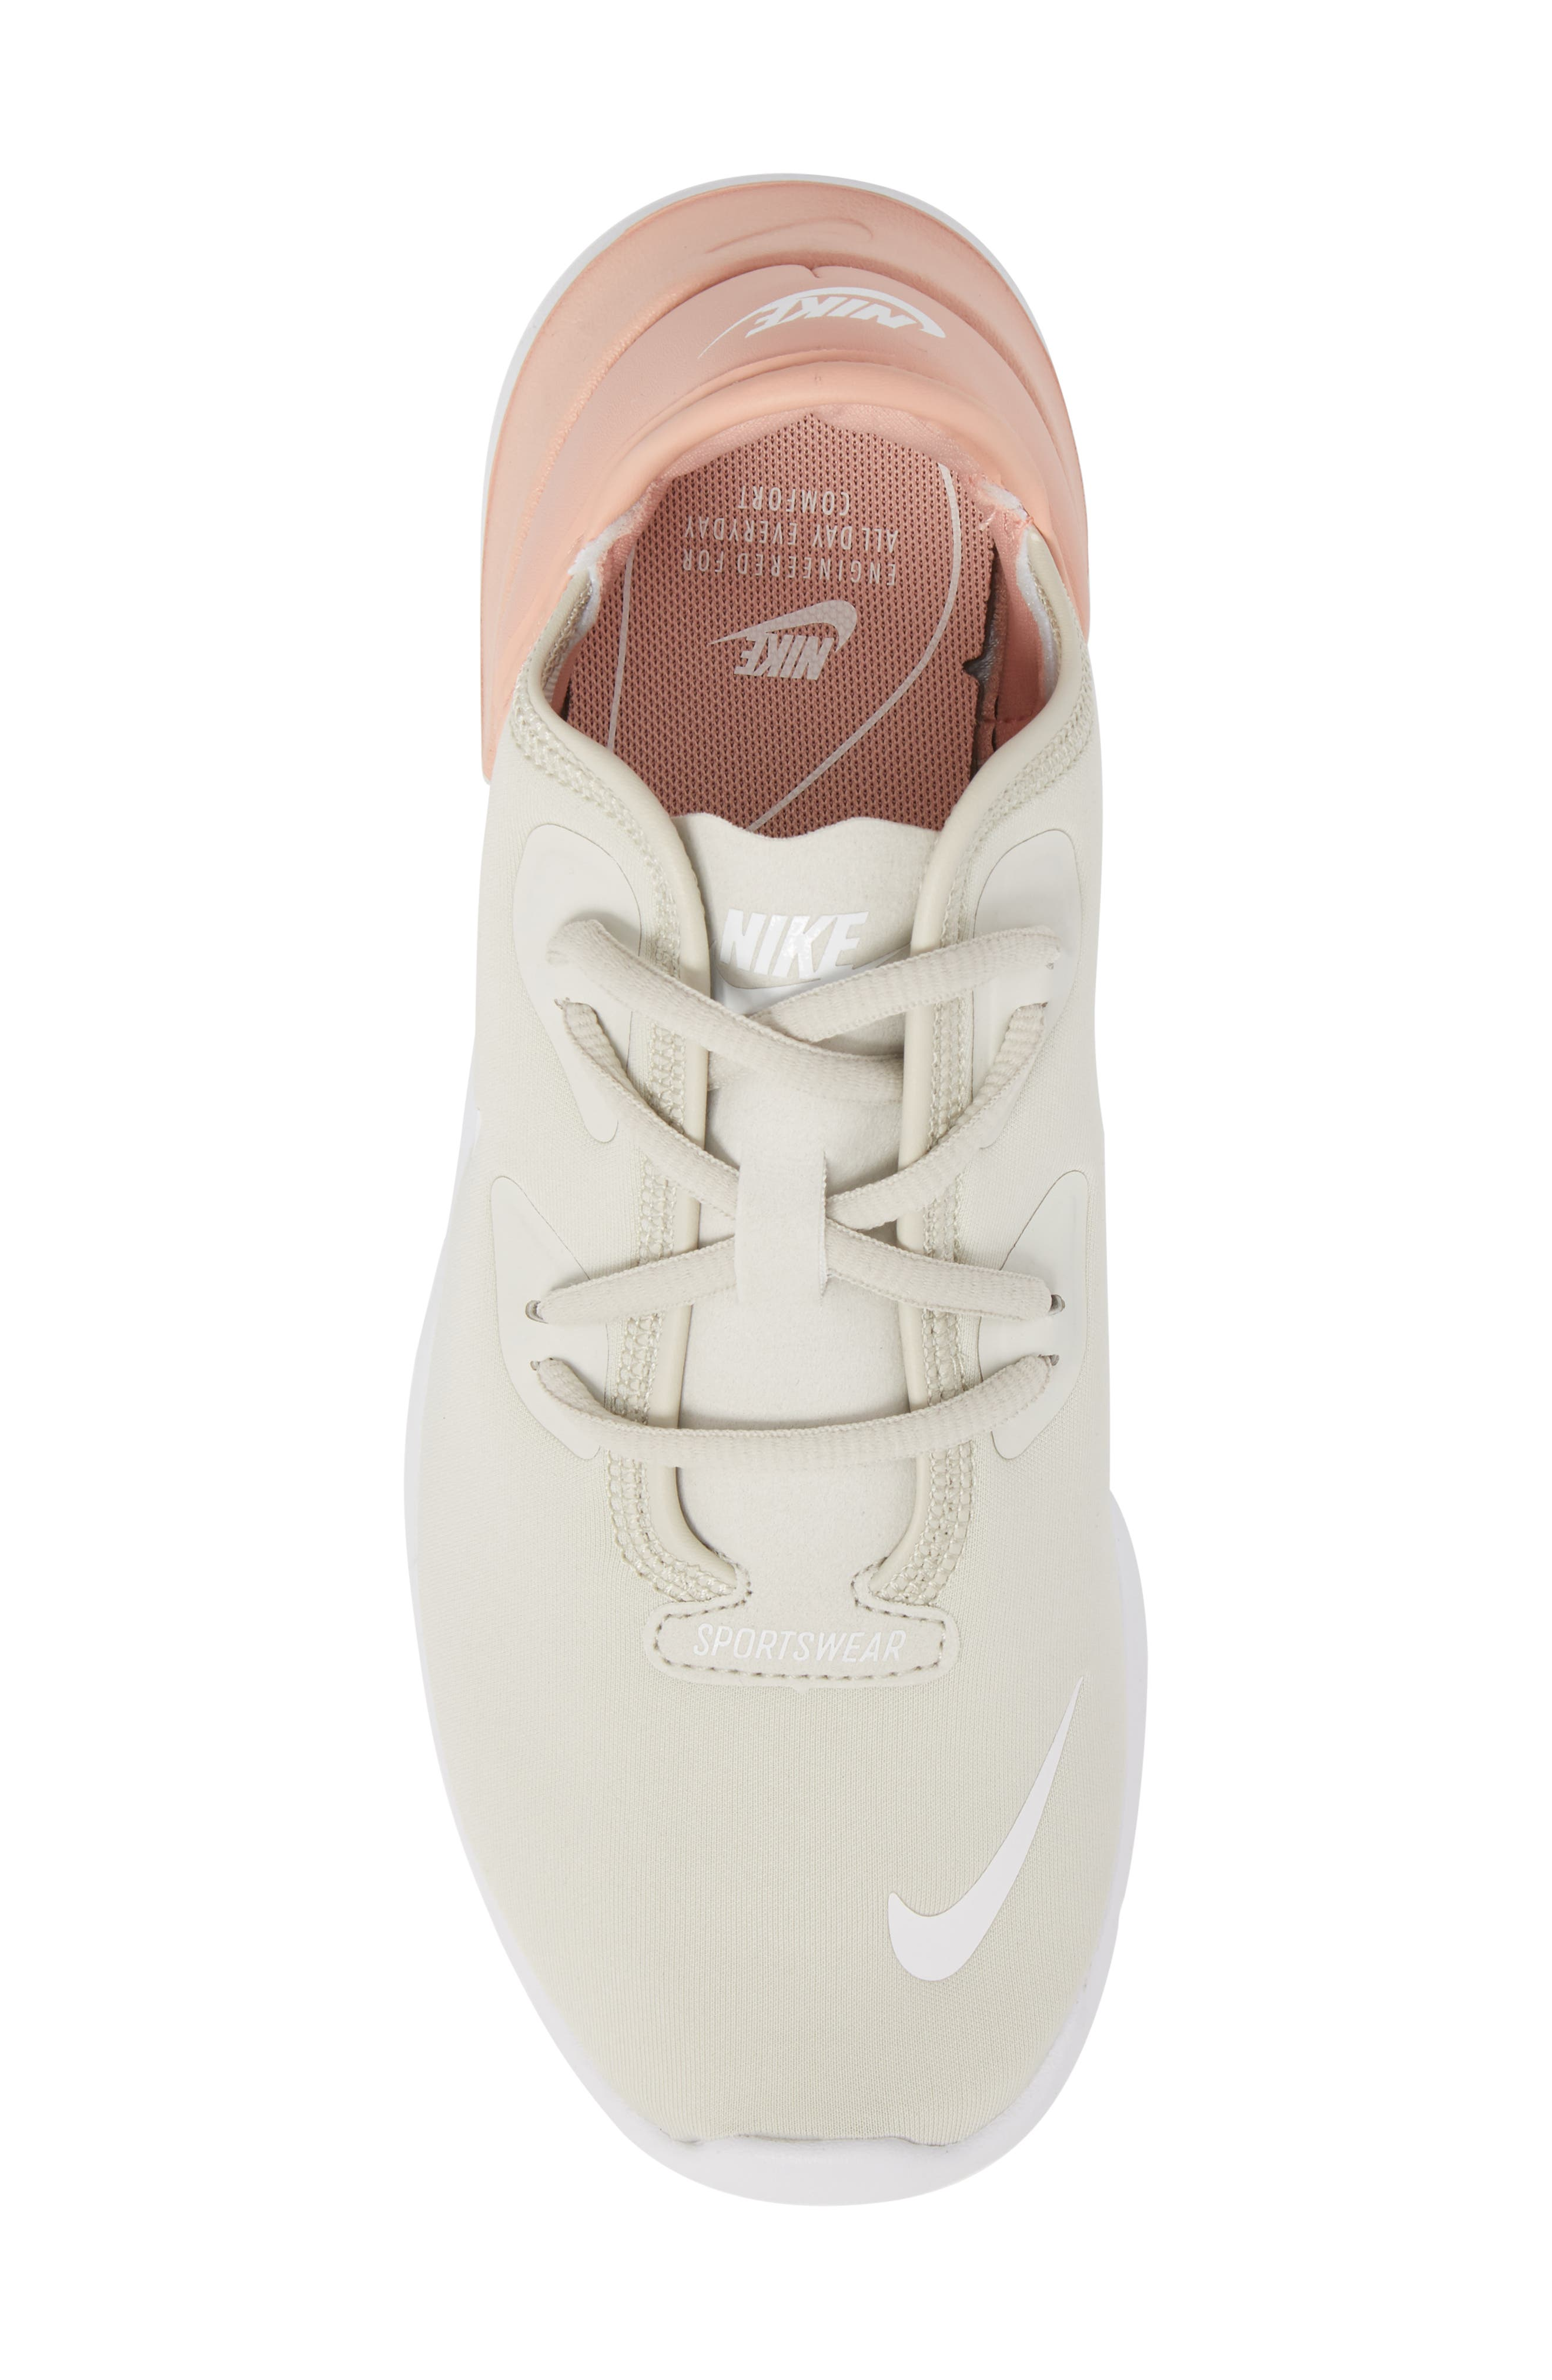 Hakata Sneaker,                             Alternate thumbnail 5, color,                             Light Bone/ White/ Coral